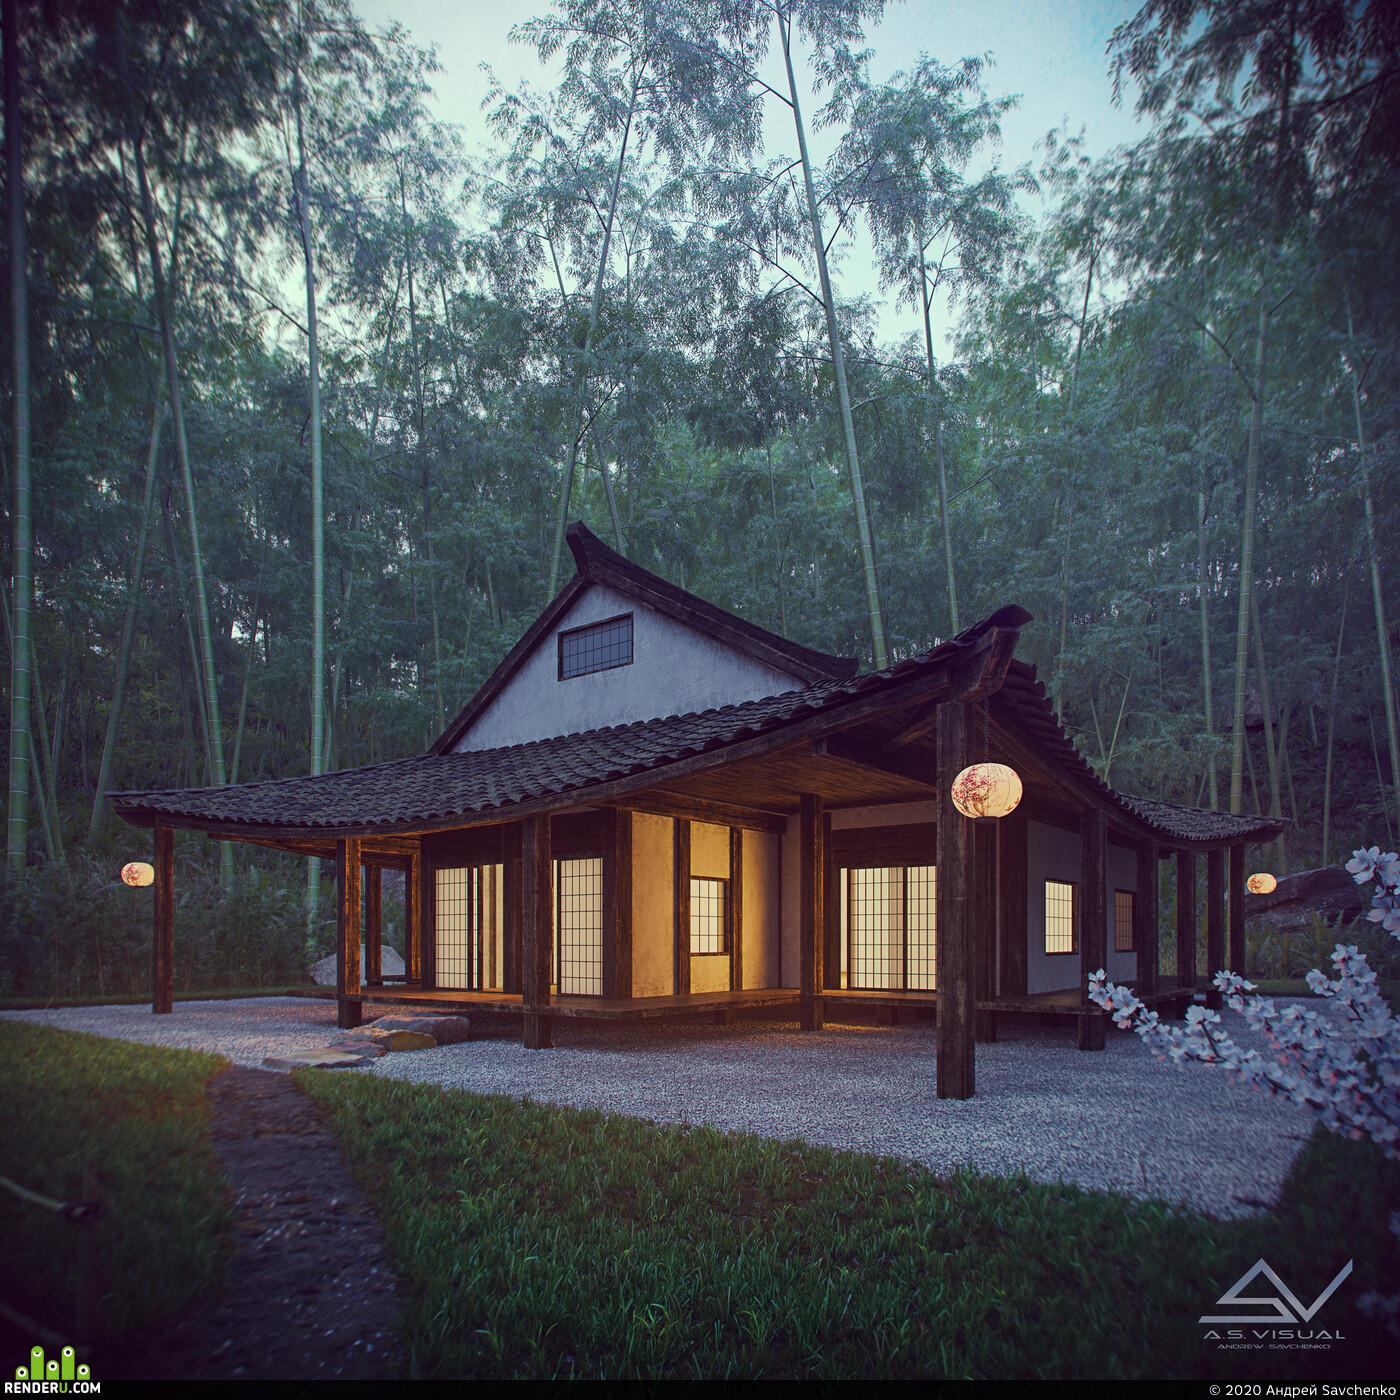 old house, forest, house in the forest, samurai, japanice, dusk